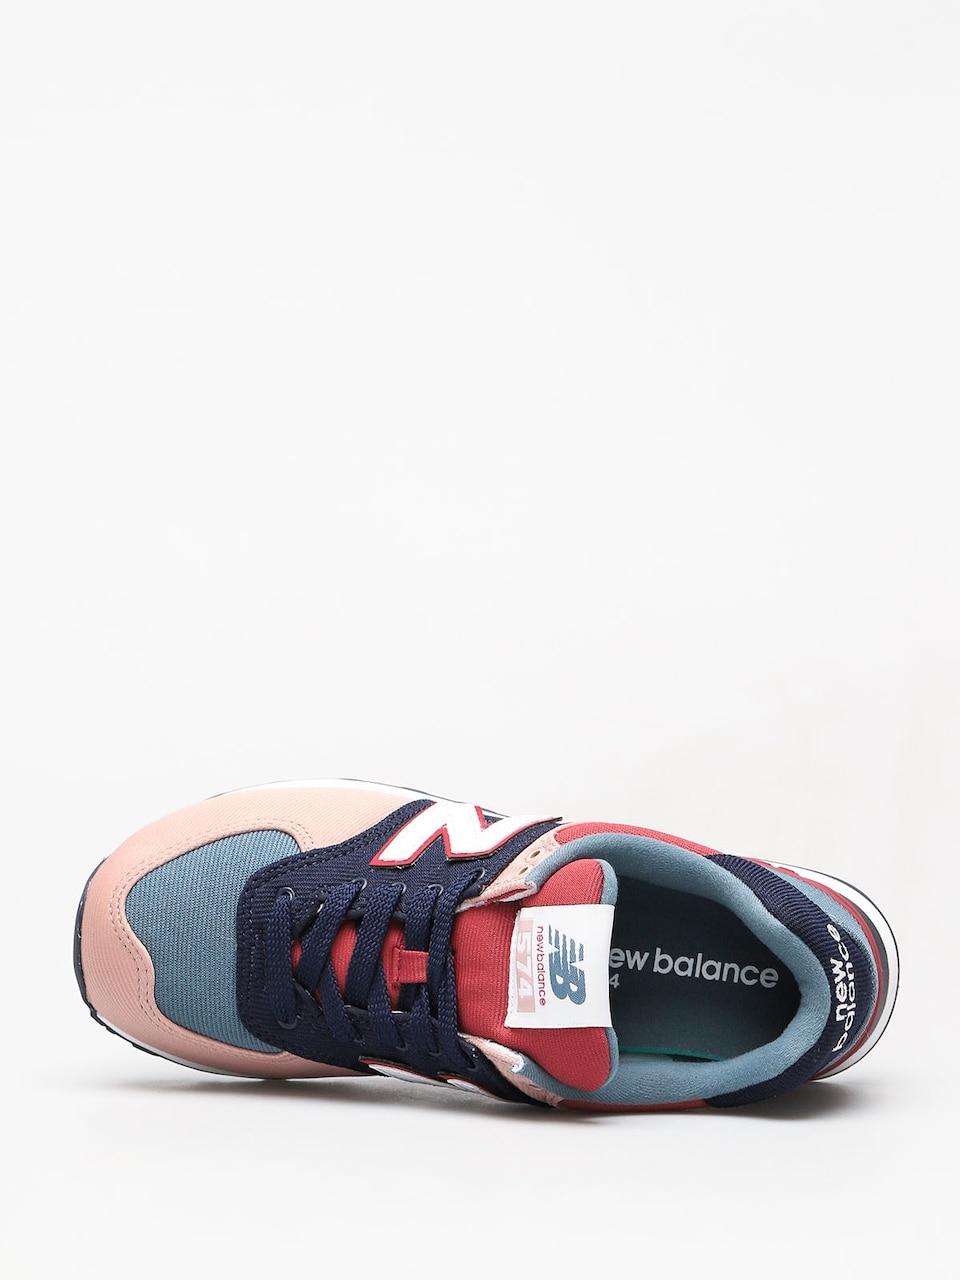 New Balance 574 Shoes Wmn (light petrol)